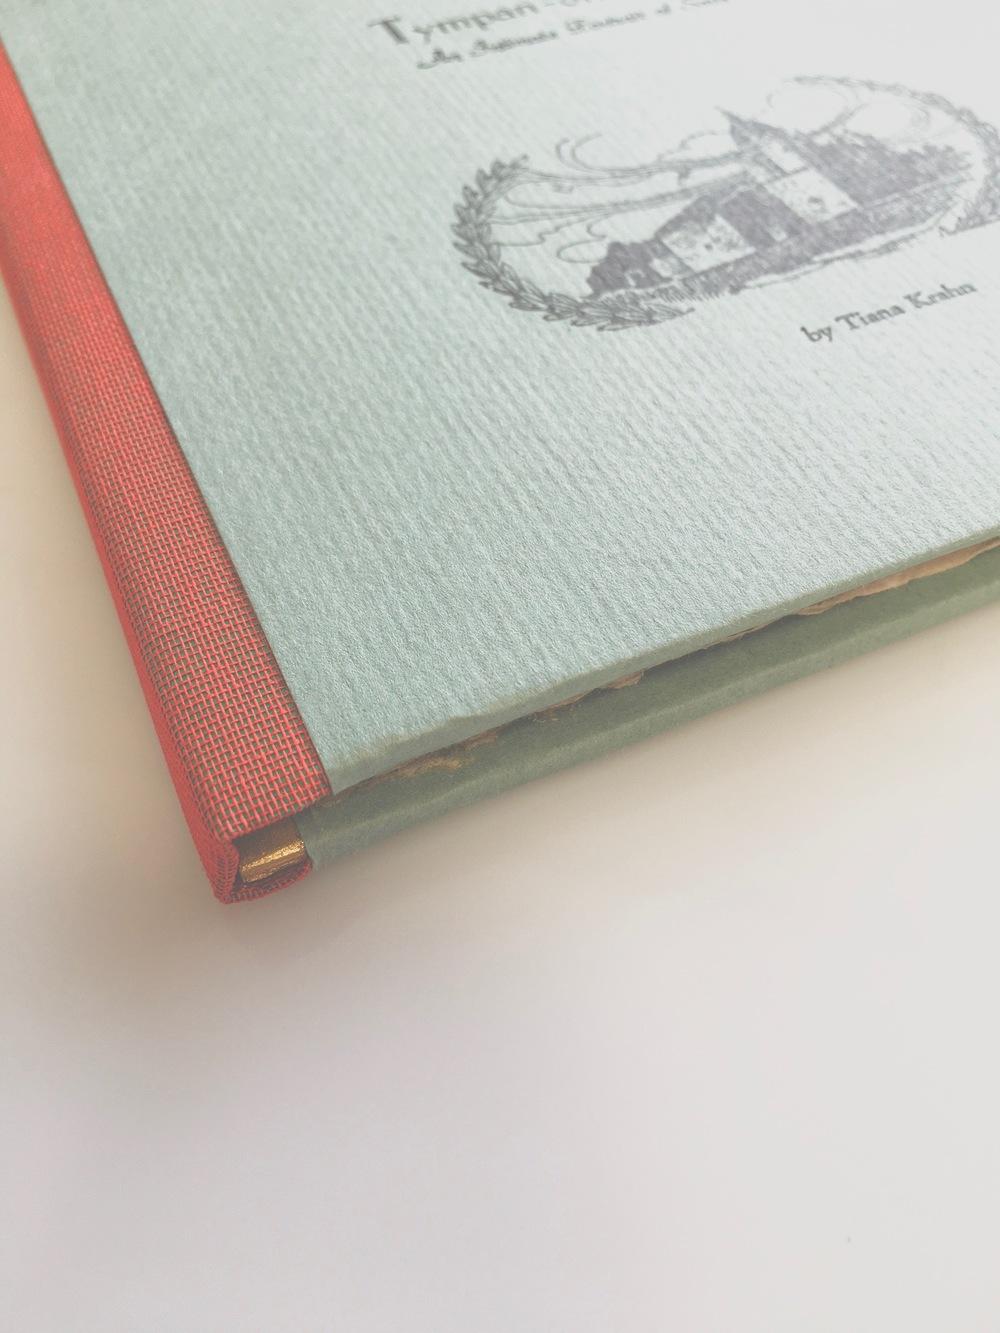 tiana krahn handmade book tympan-on-tyne